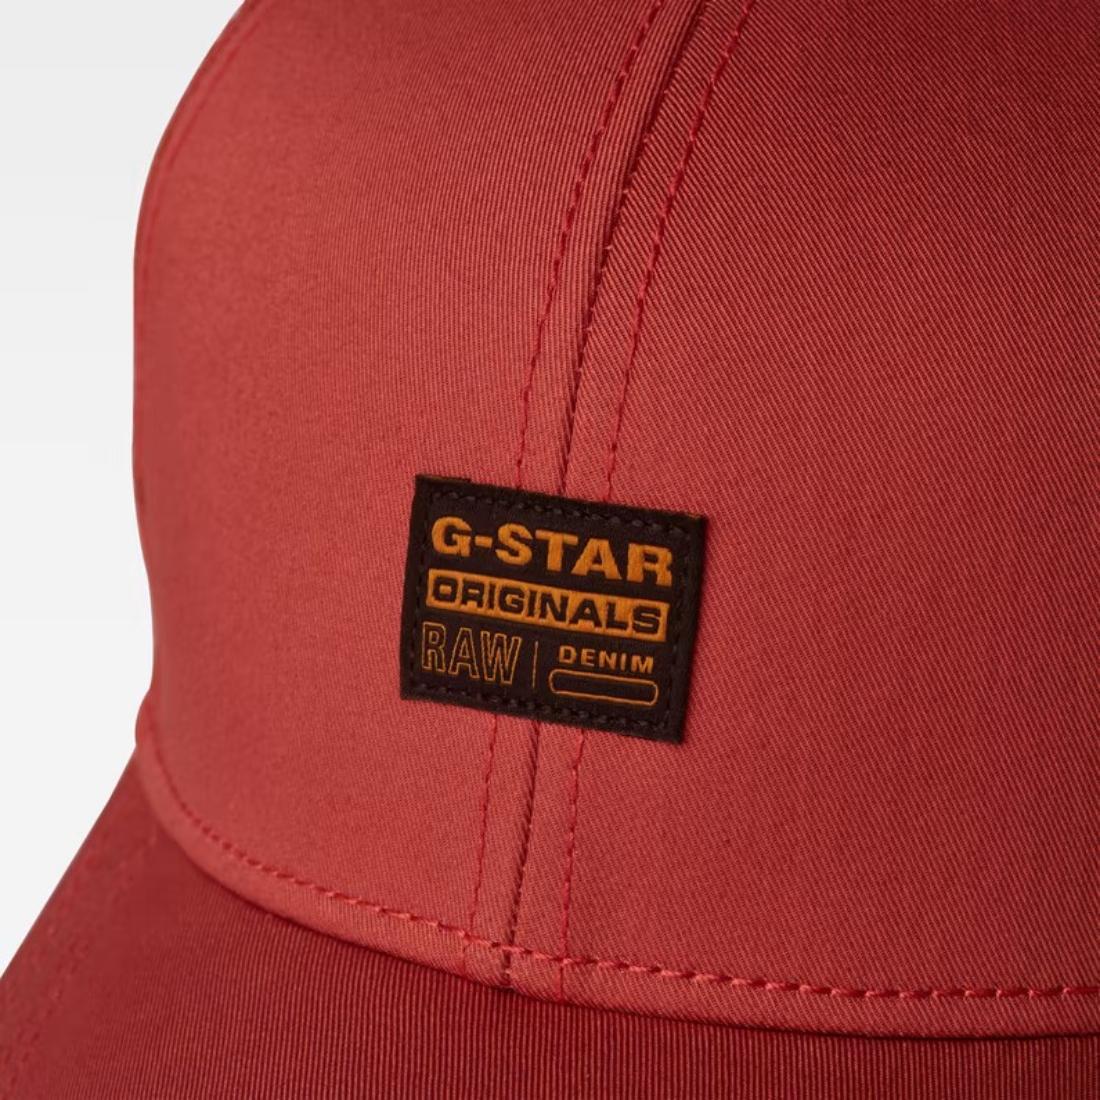 G STAR RAW ORIGINALS BASEBALL CAP 1